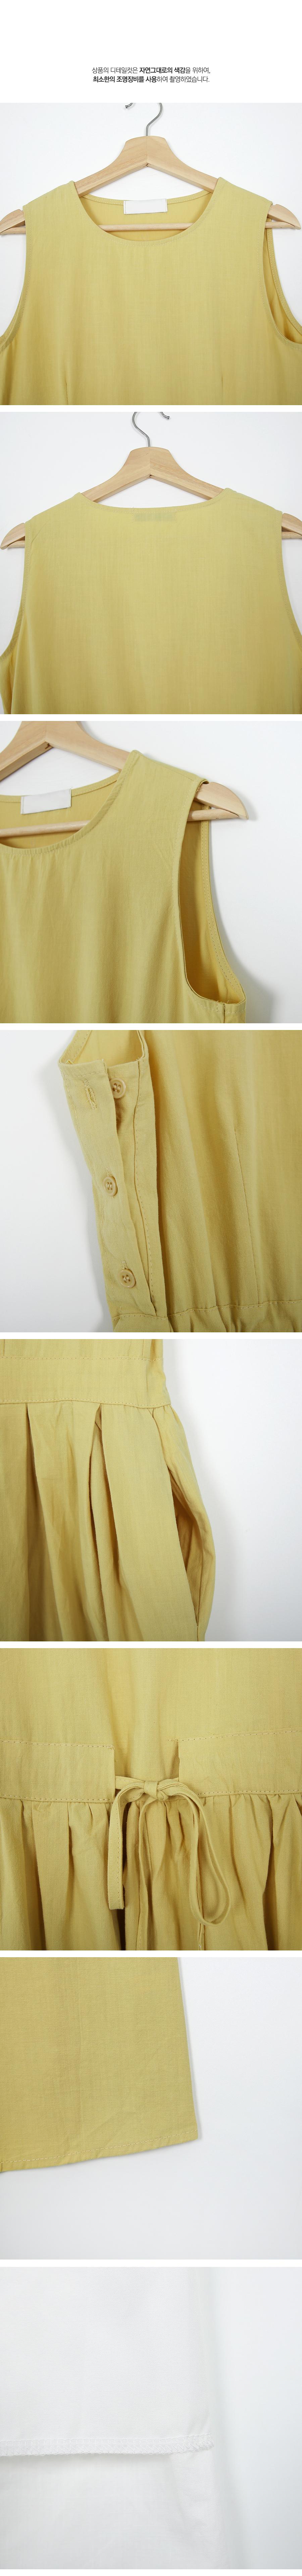 Mike Beach back string dress